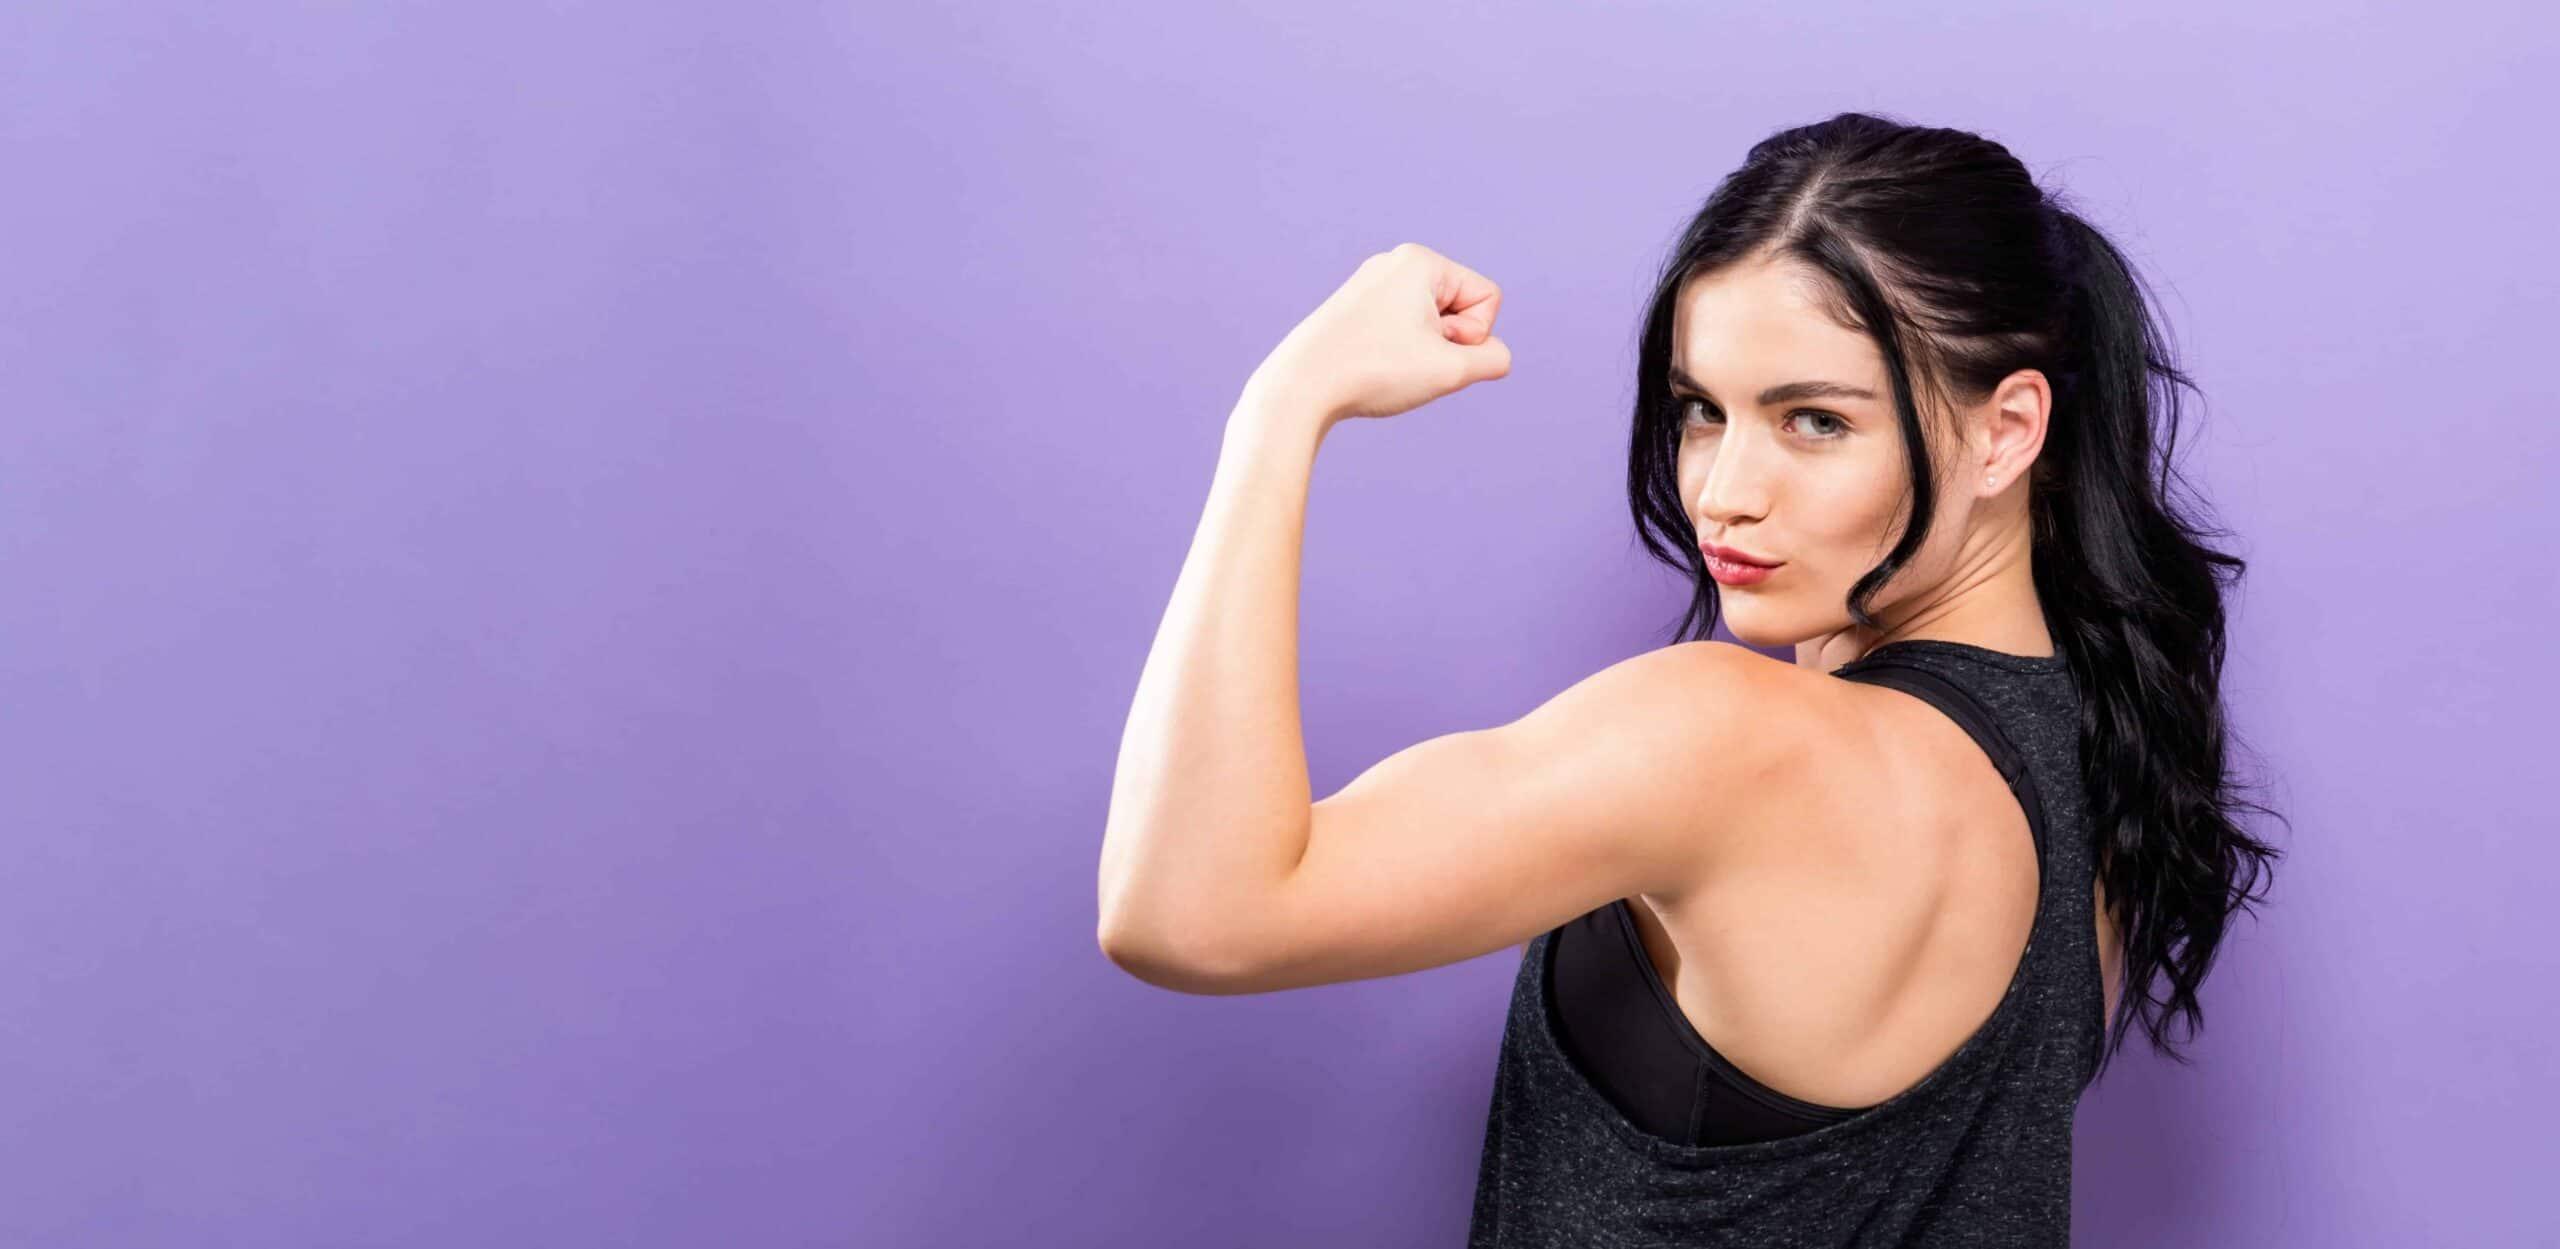 esercizi per braccia toniche donna